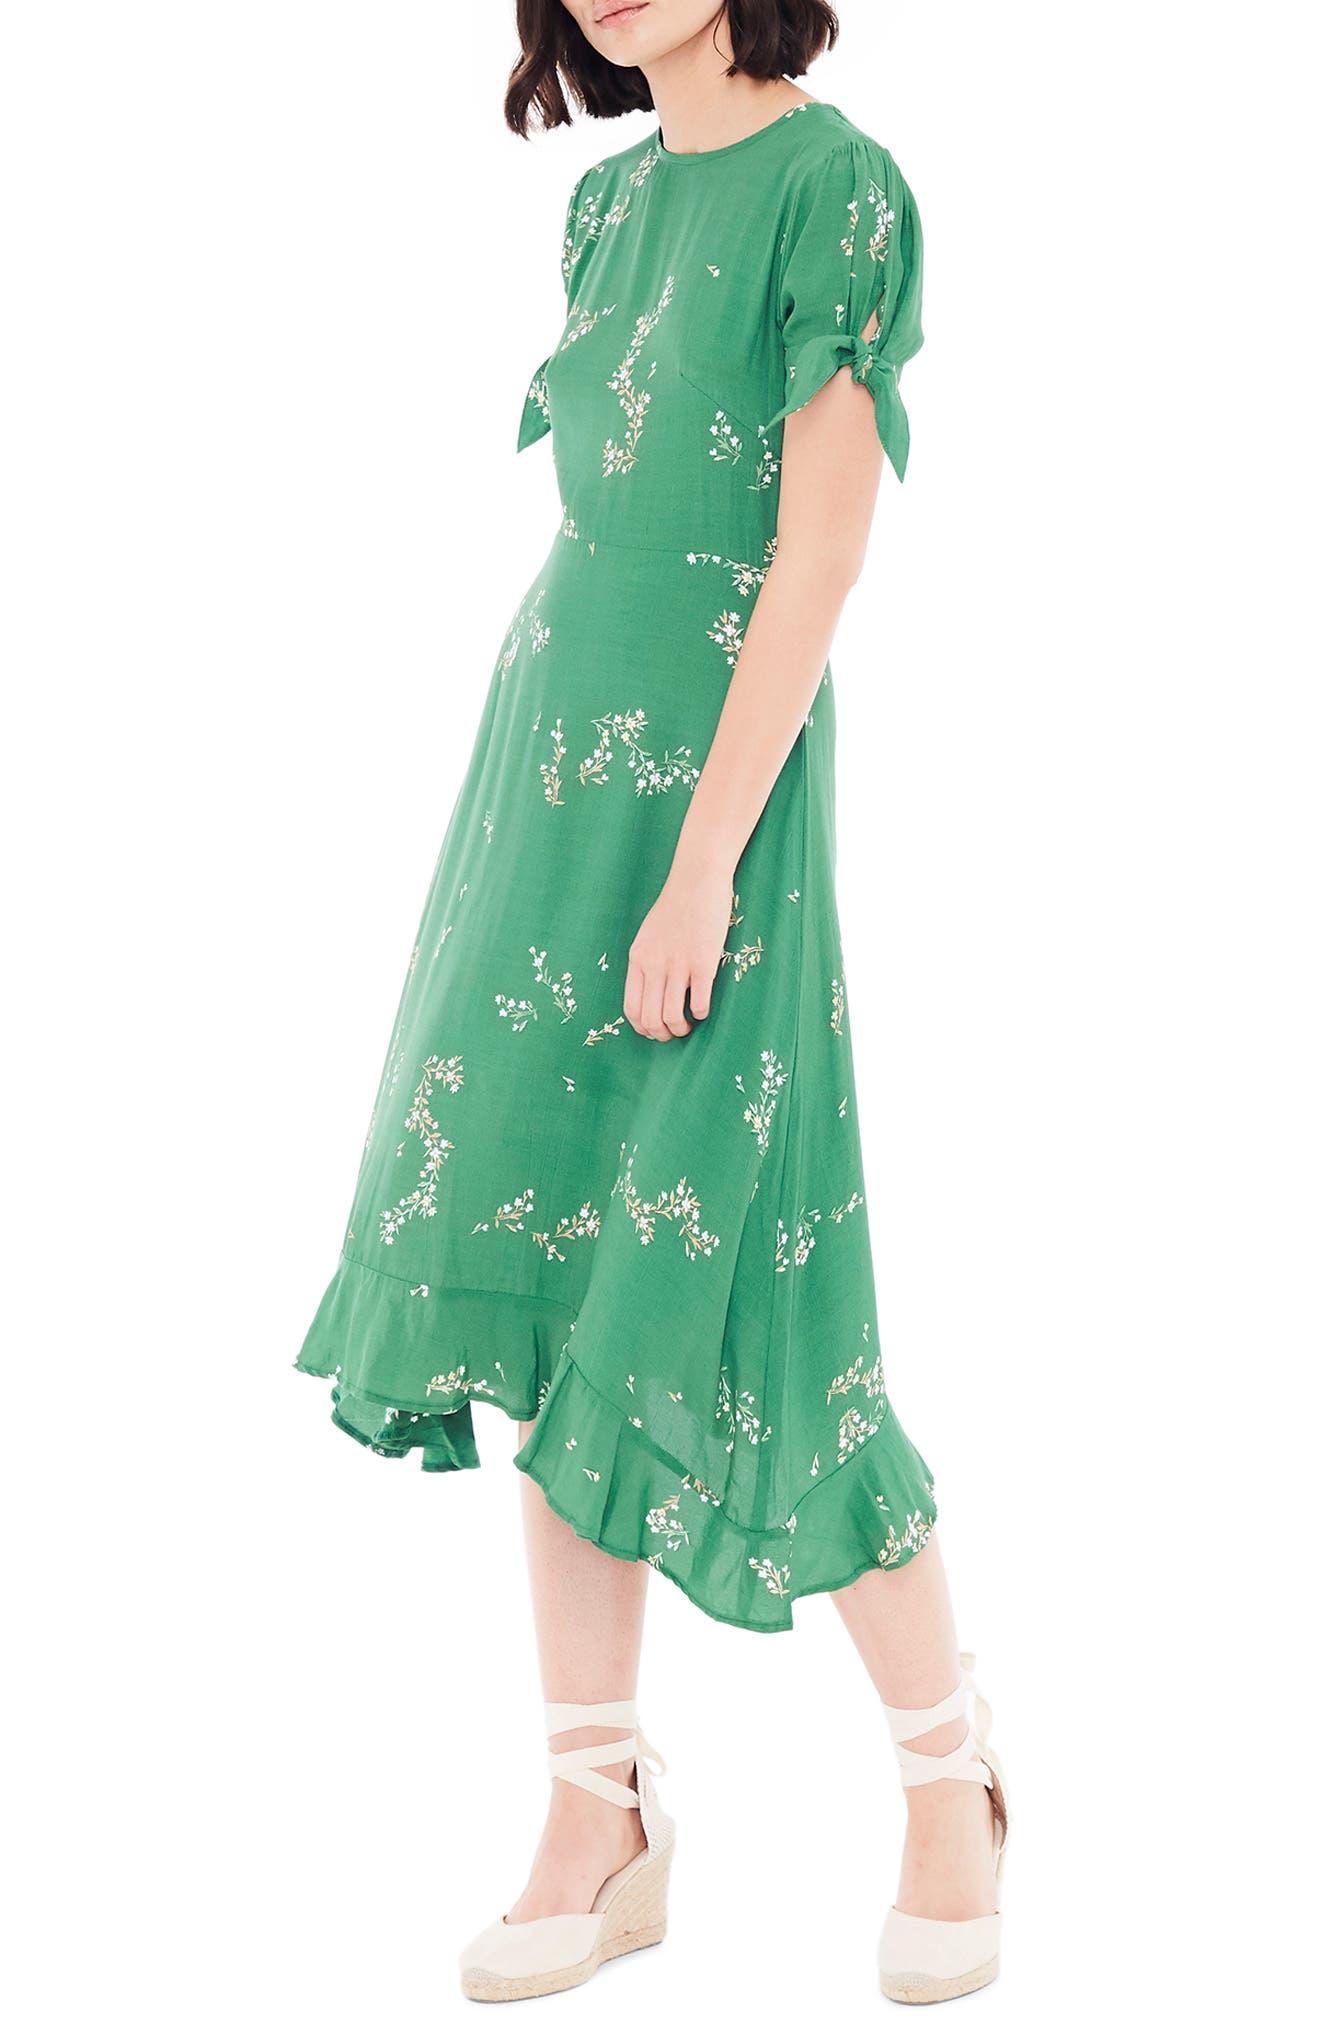 FAITHFULL THE BRAND, Emilia Floral Midi Dress, Alternate thumbnail 4, color, MYRTILLE FLORAL PRINT - GREEN